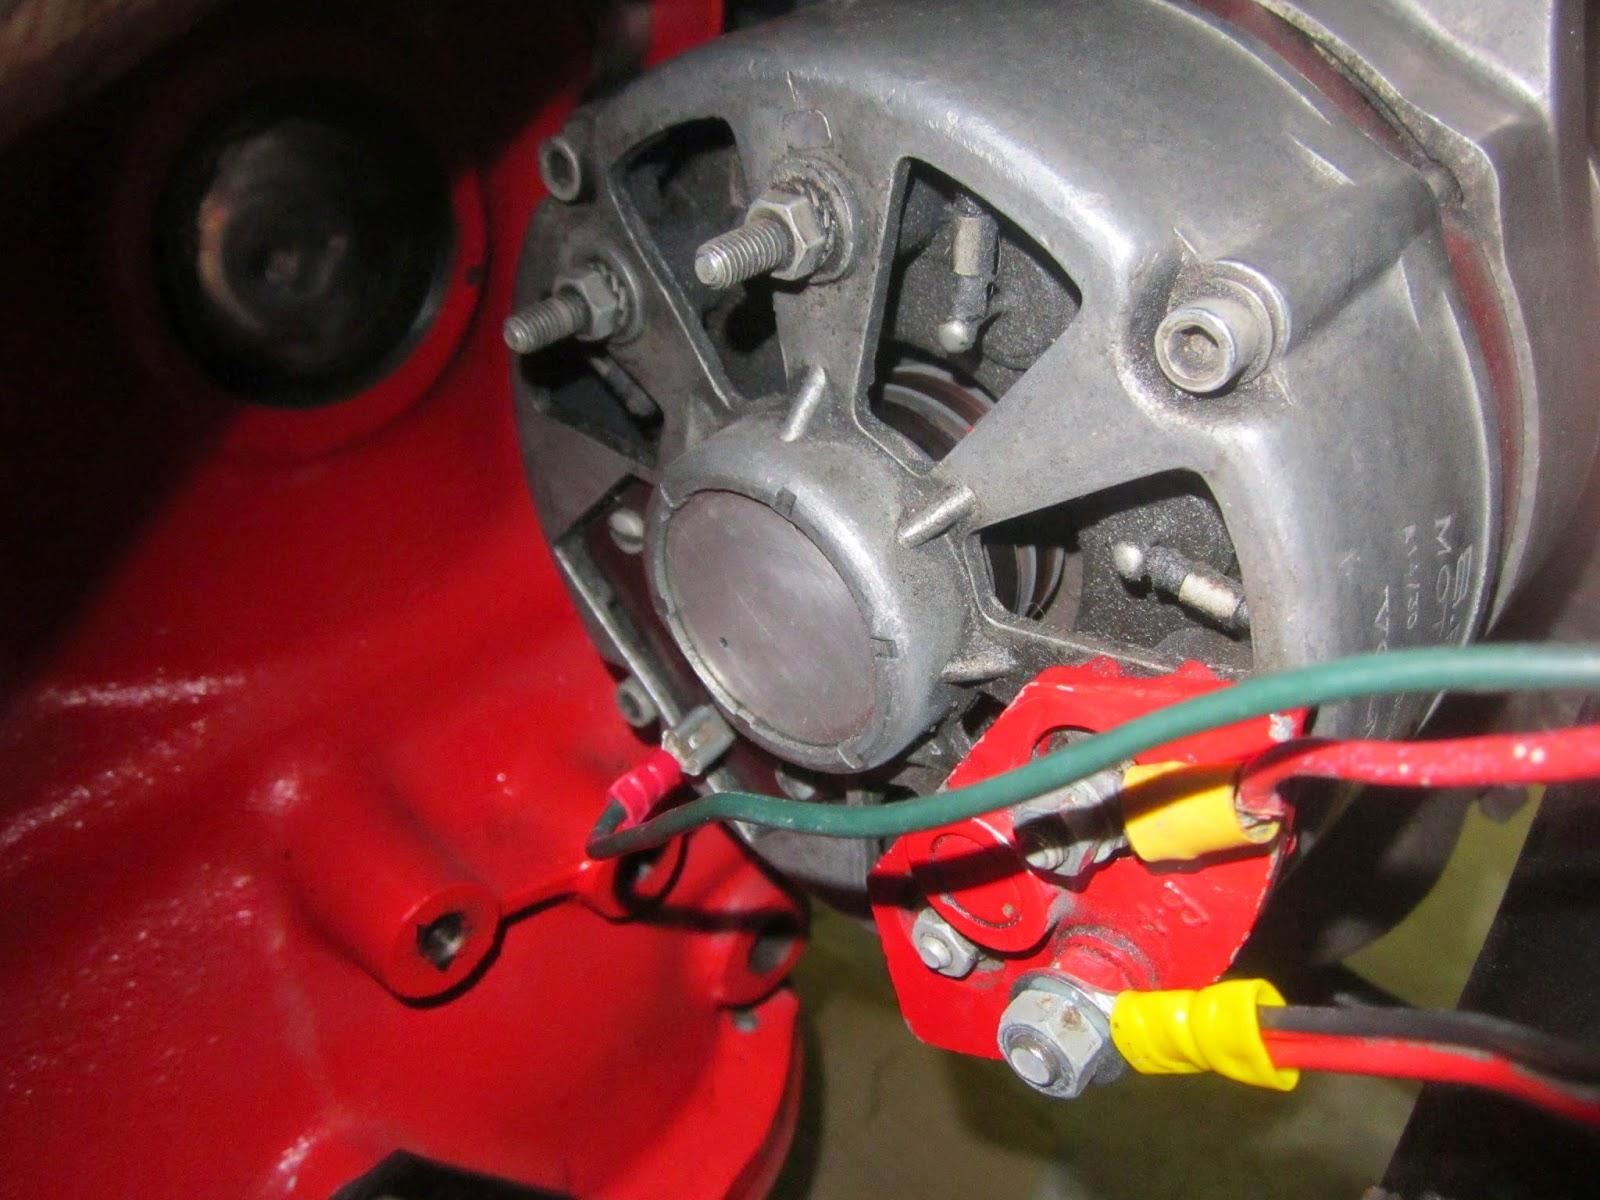 sev marchal alternator wiring motorcraft alternator wiring sev marchal alternator 14v 35a bosch alternator wiring diagram [ 1600 x 1200 Pixel ]